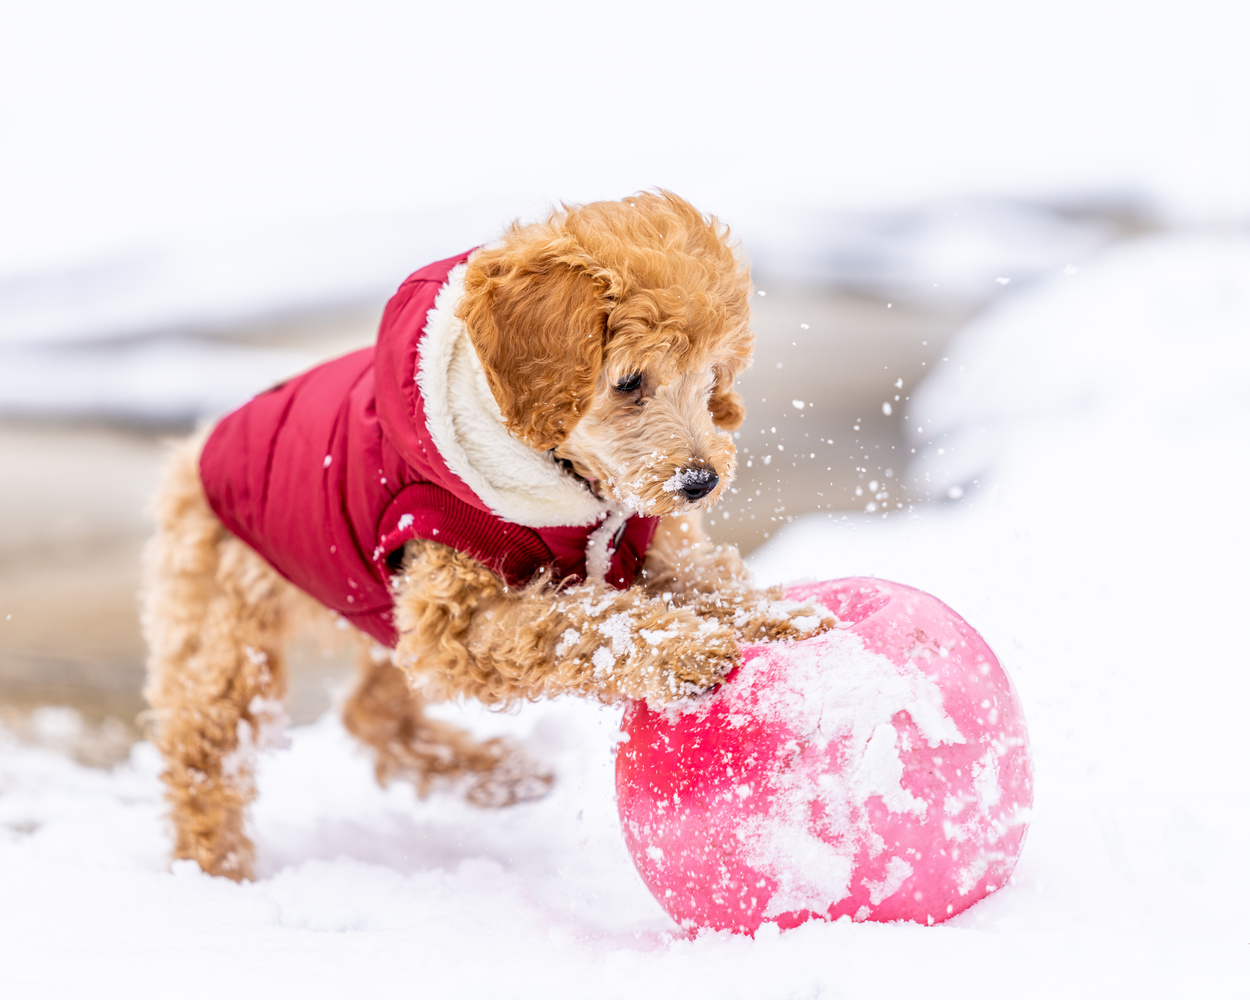 Puppy by Skyler Ewing